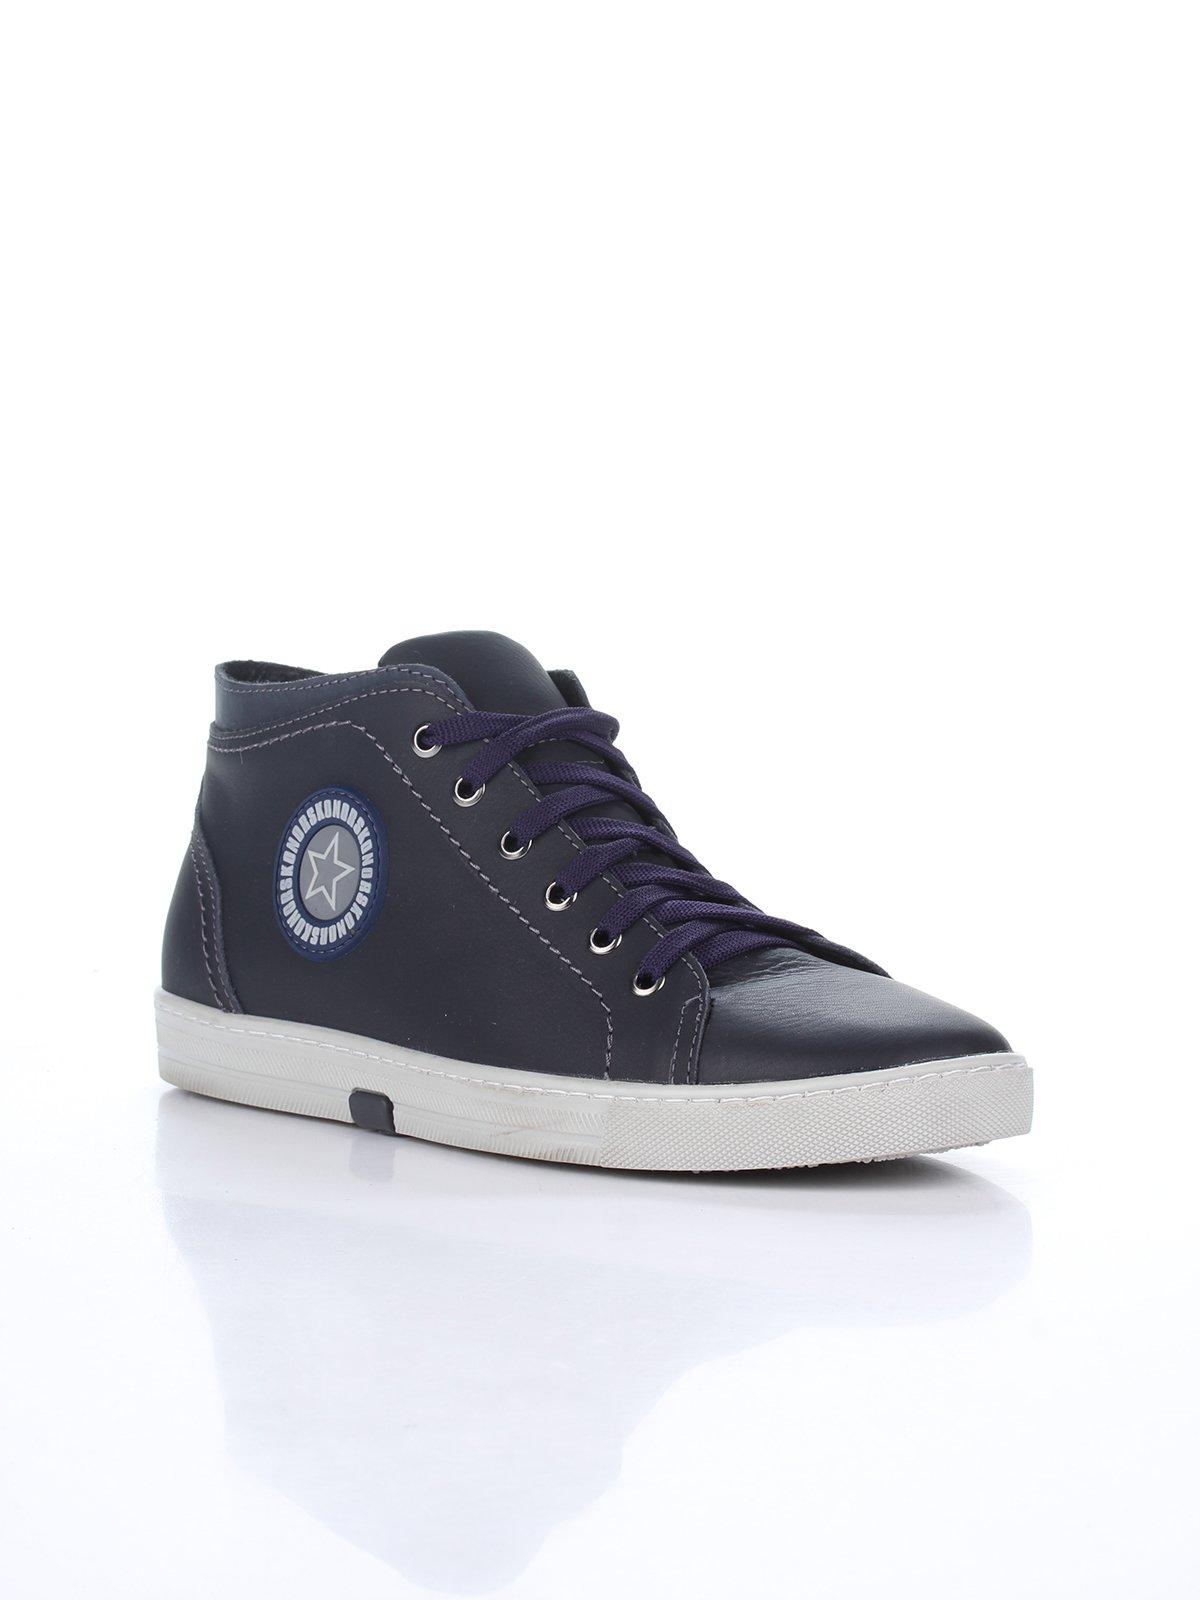 Кроссовки синие | 1960108